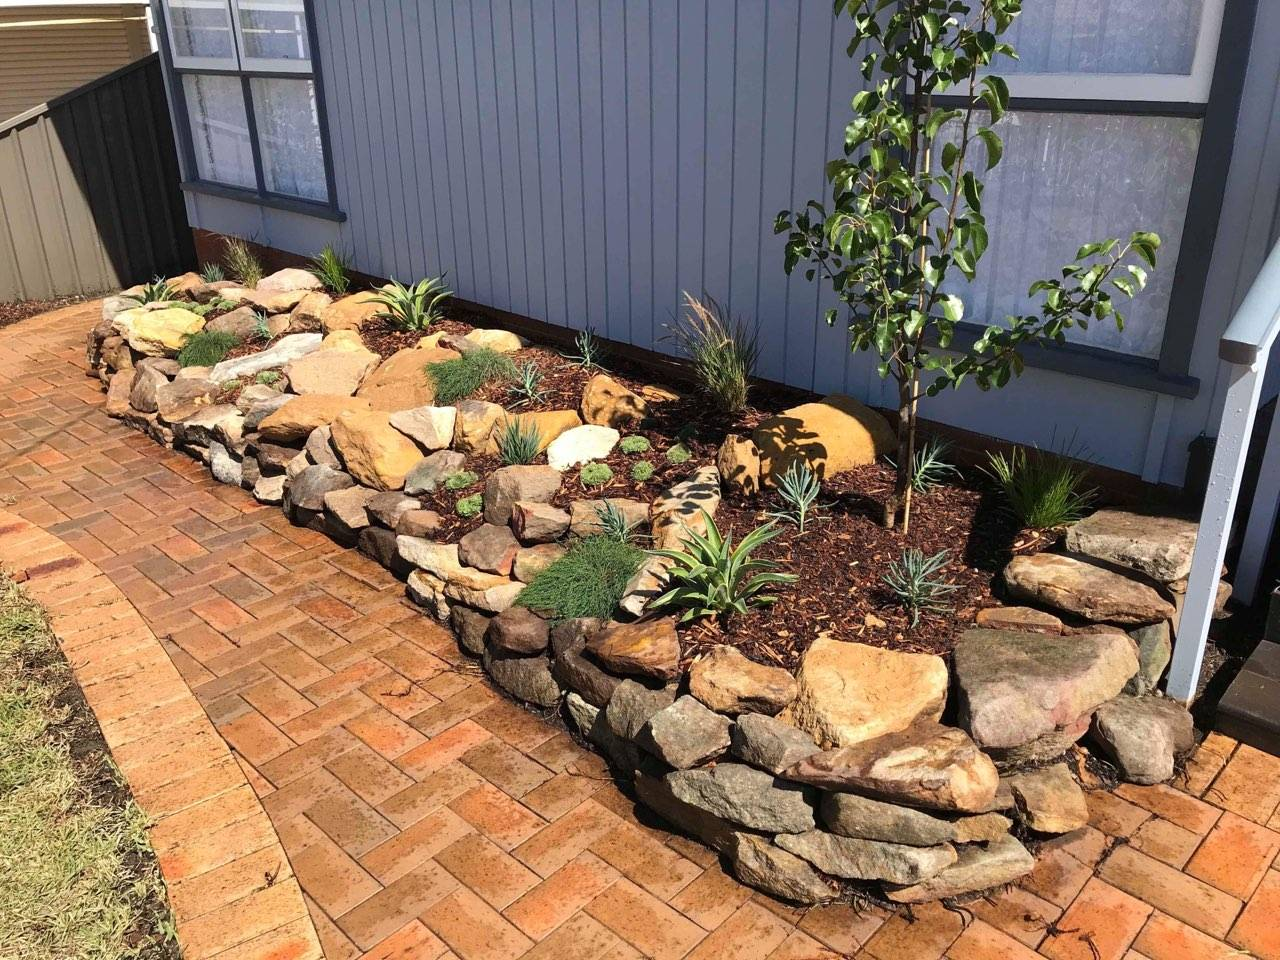 Rockery Garden Ideas Using Drought Tolerant Plants